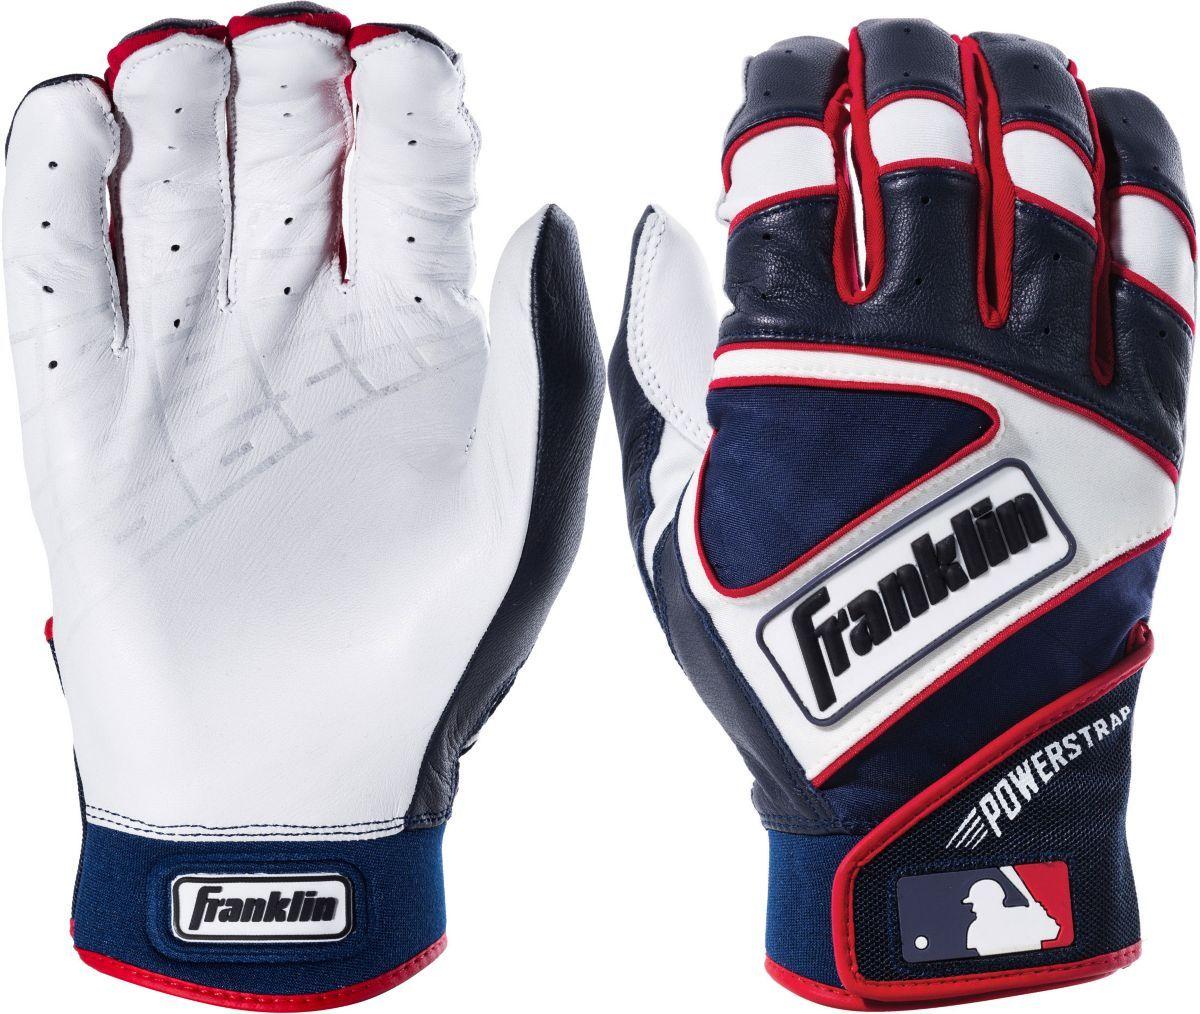 Franklin Adult Powerstrap Batting Gloves Batting Gloves Youth